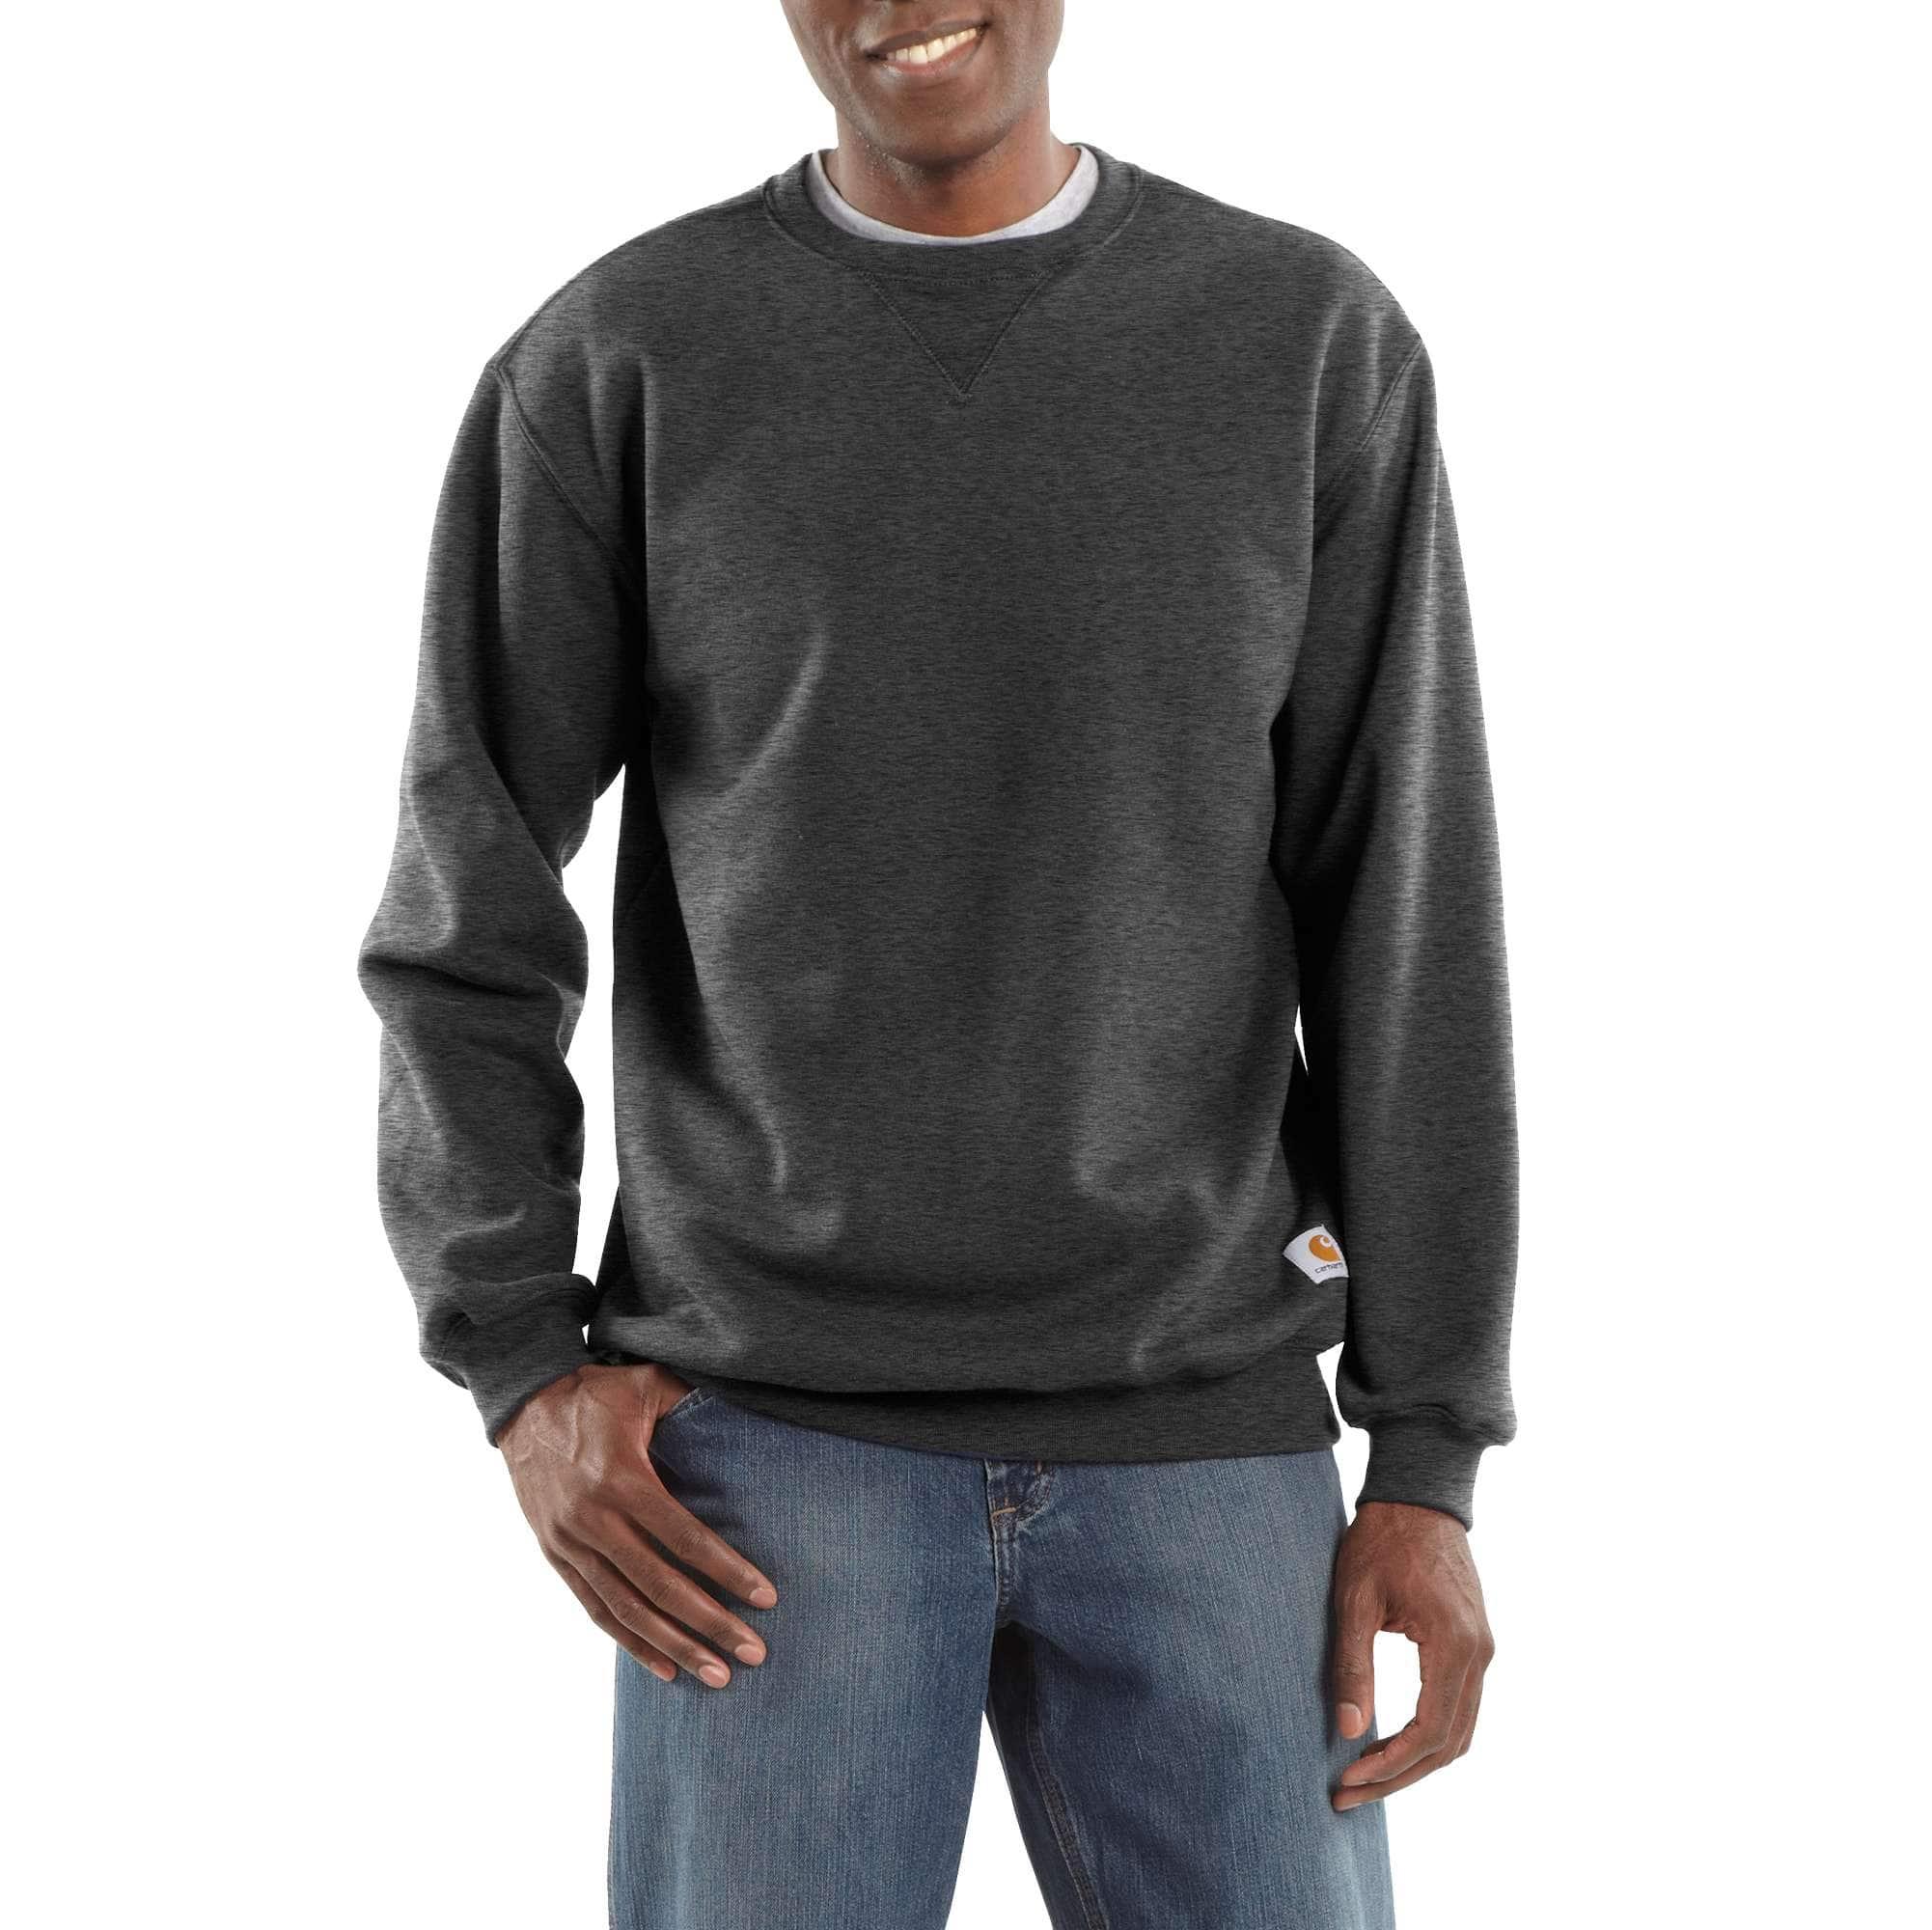 94fc0065f488 Men s Midweight Crewneck Sweatshirt K124